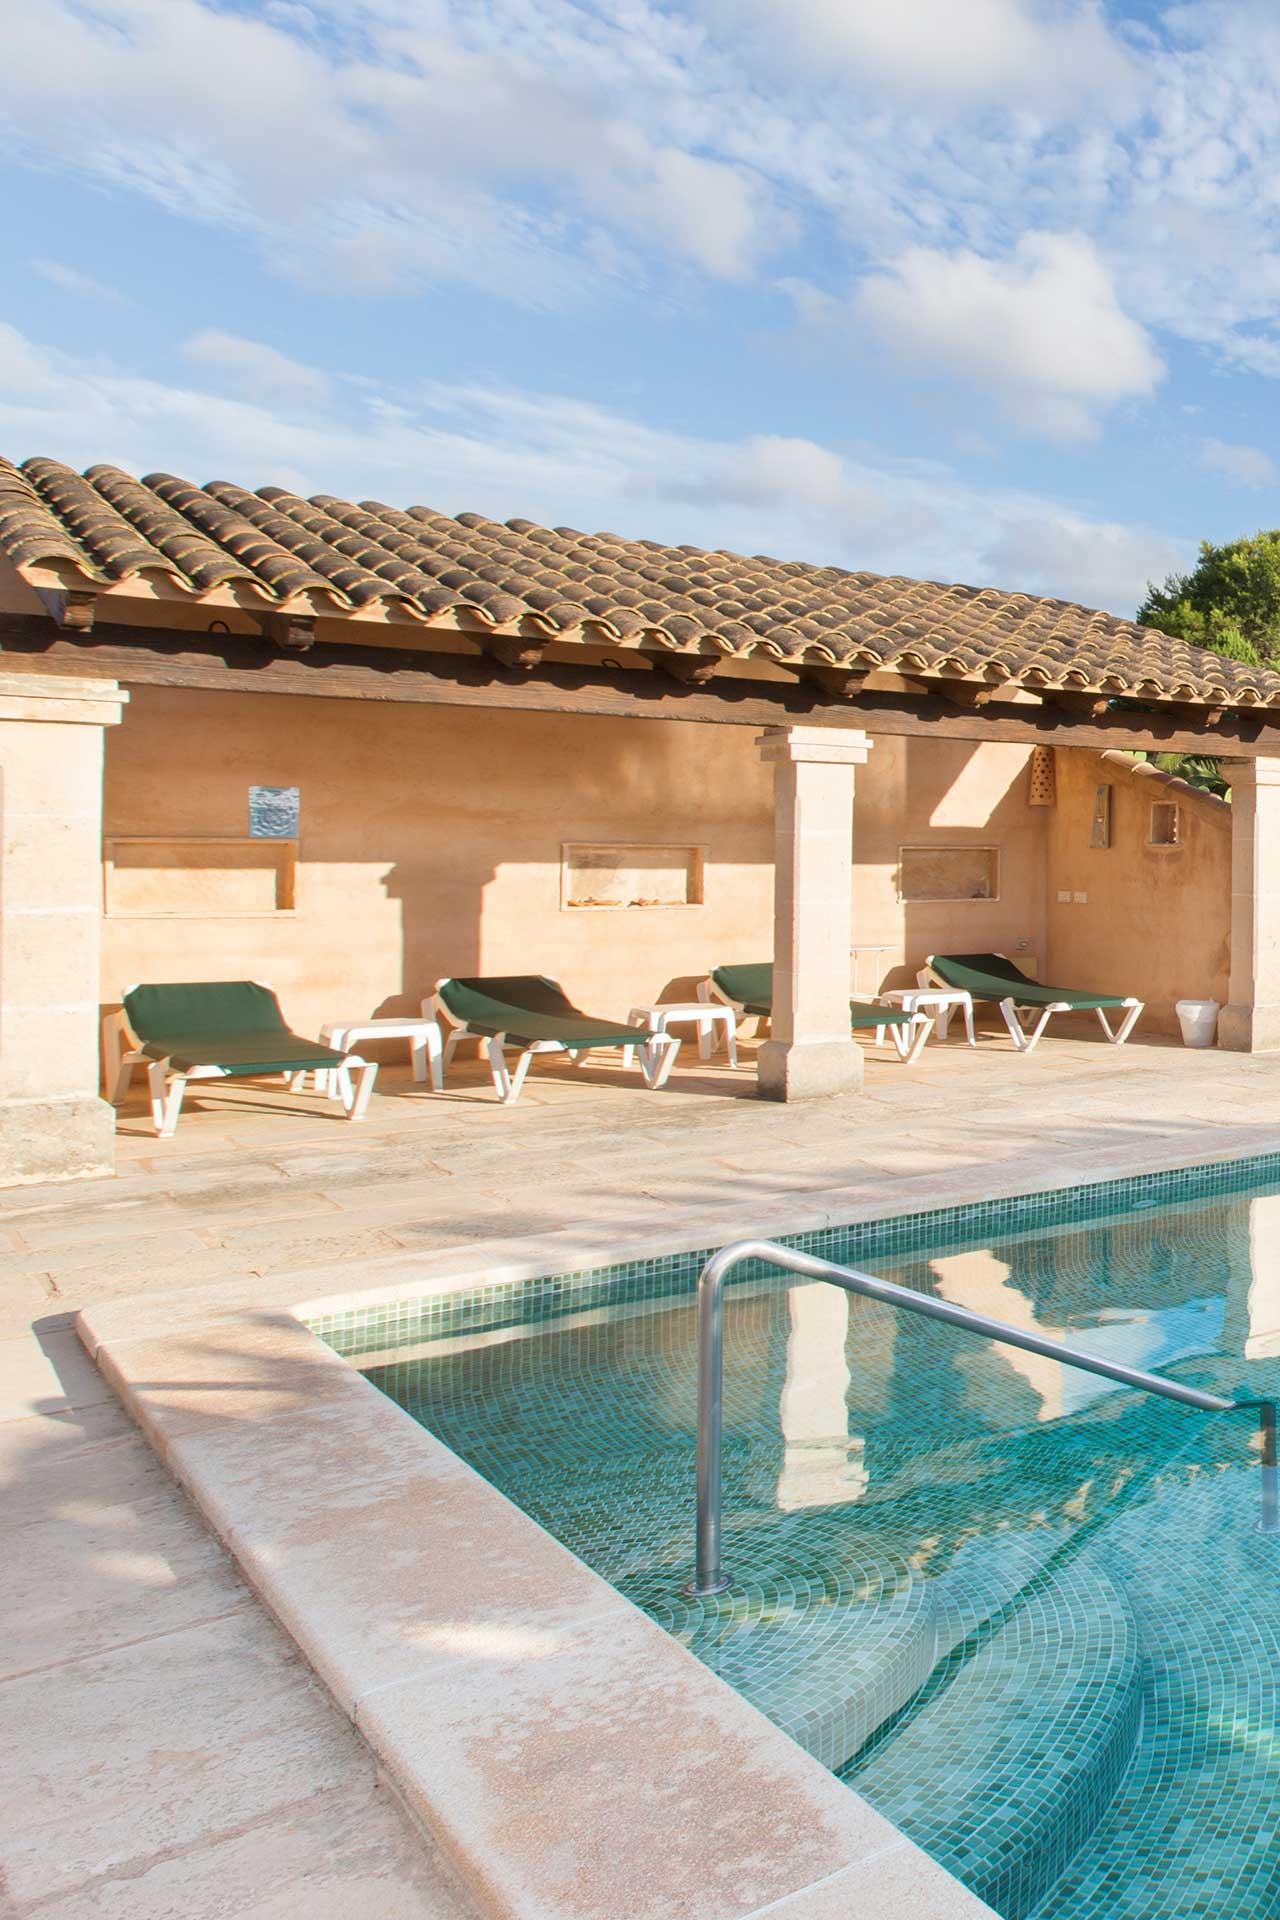 Finca C'an Murtera - Swimming pool with pool house